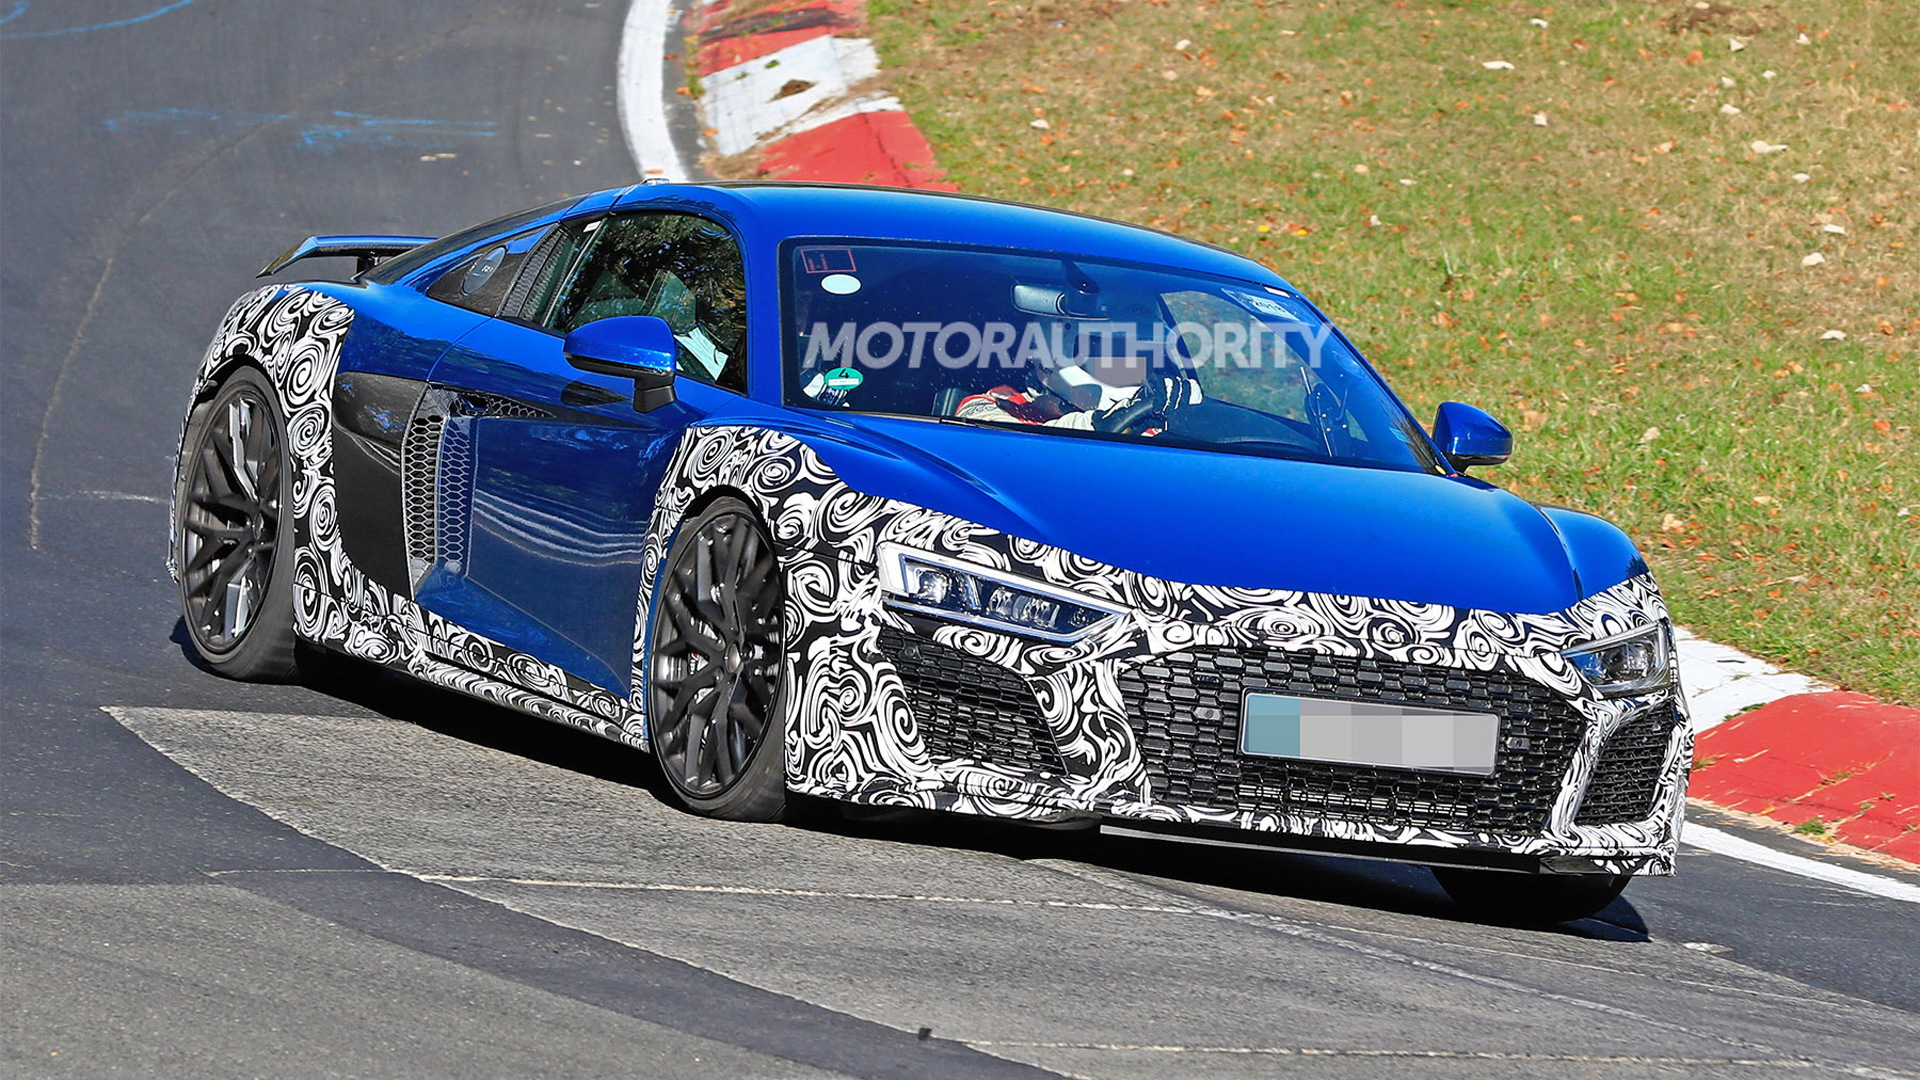 2020 Audi R8 facelift spy shots - Image via S. Baldauf/SB-Medien